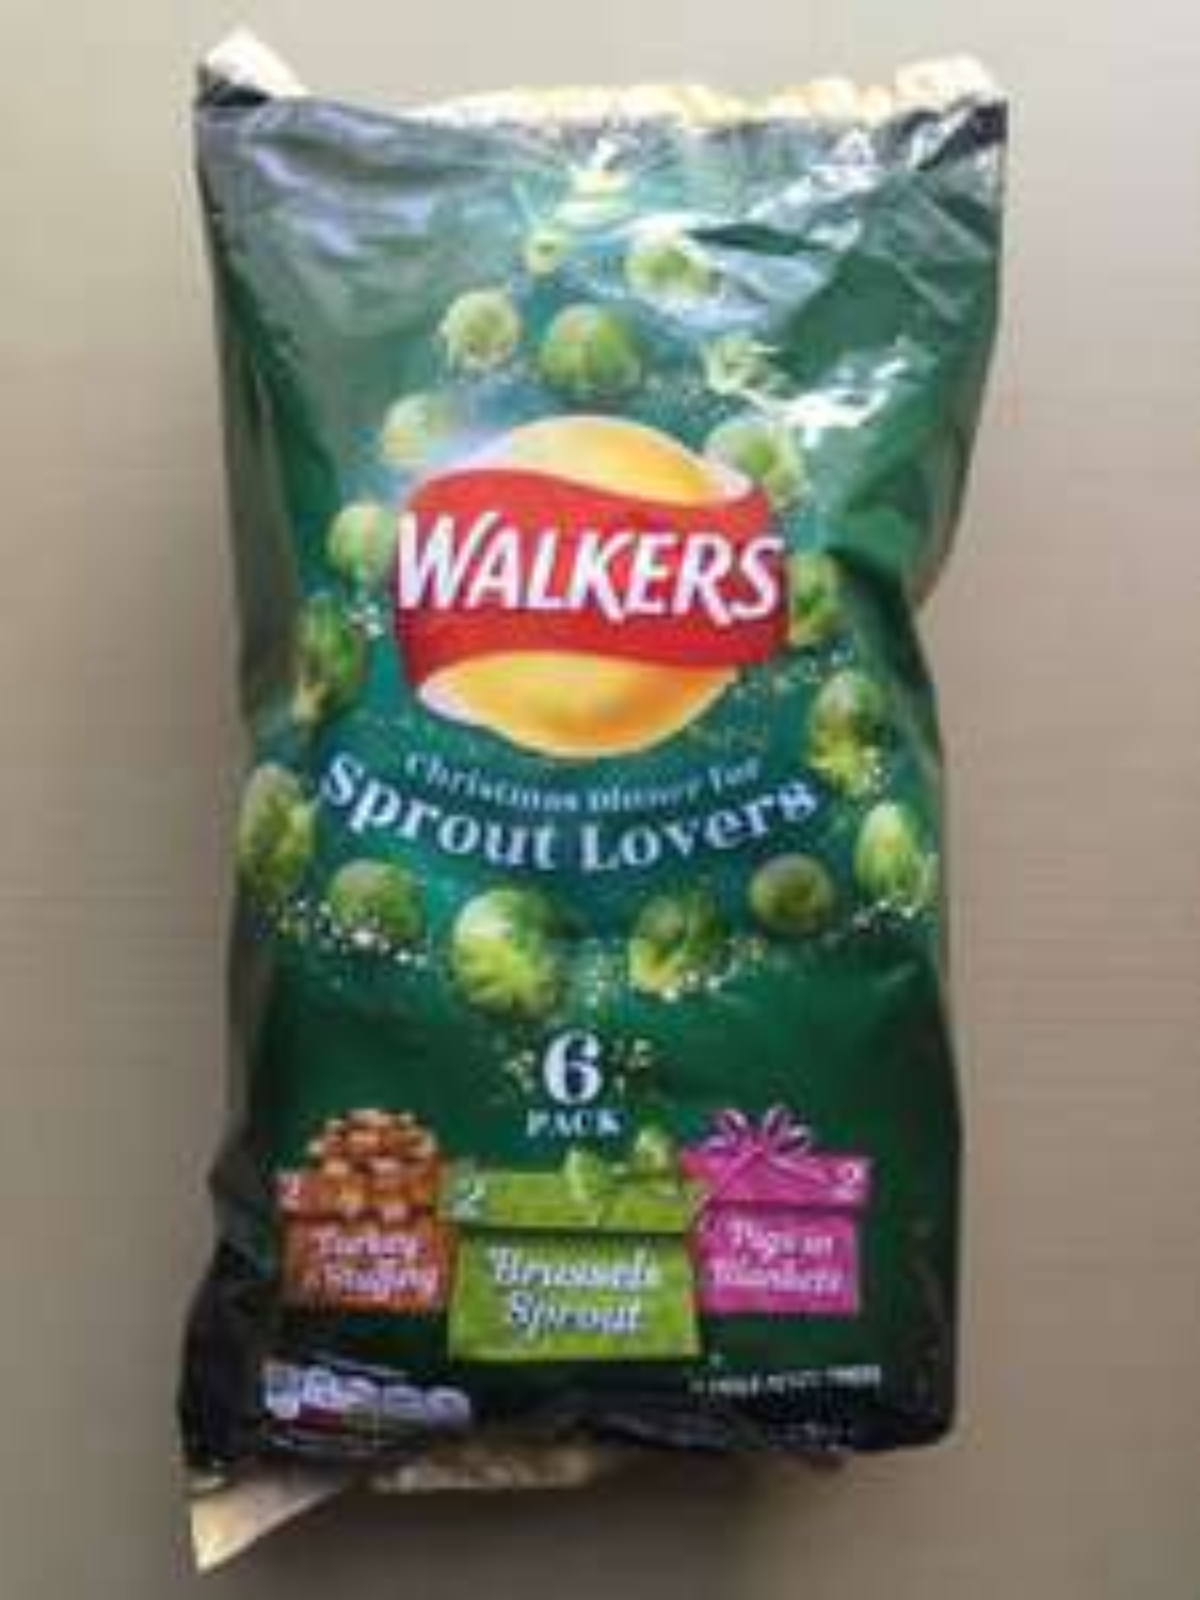 Walker's Xmas crisps 50p @ One Stop